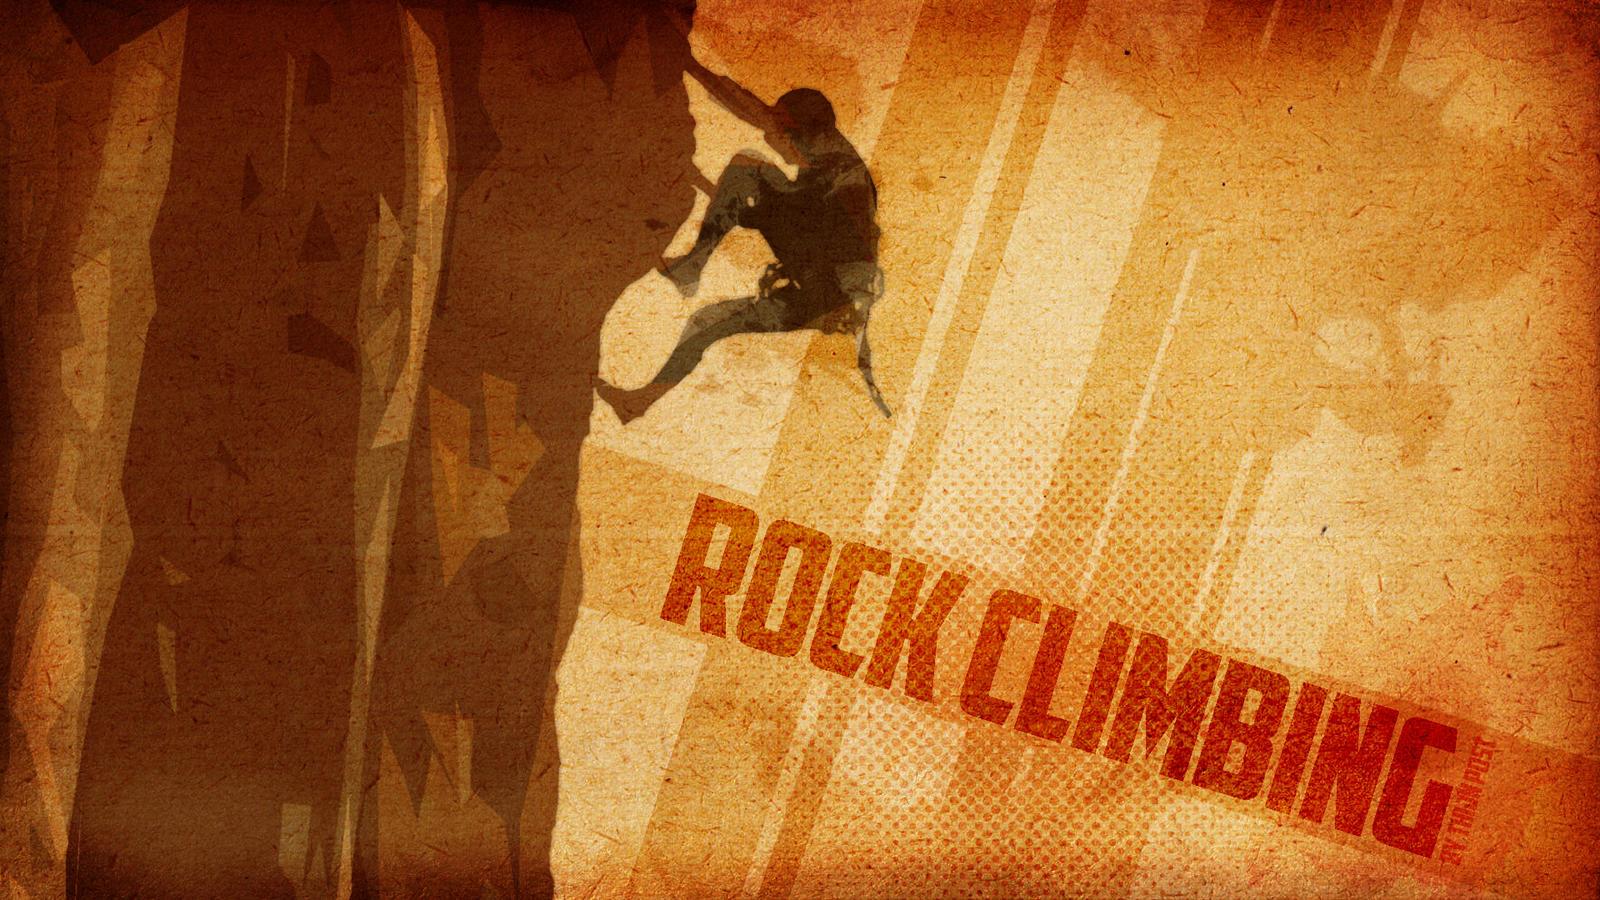 RockClimbing - Wallpaper (1920x1080) by thijnpost on ...